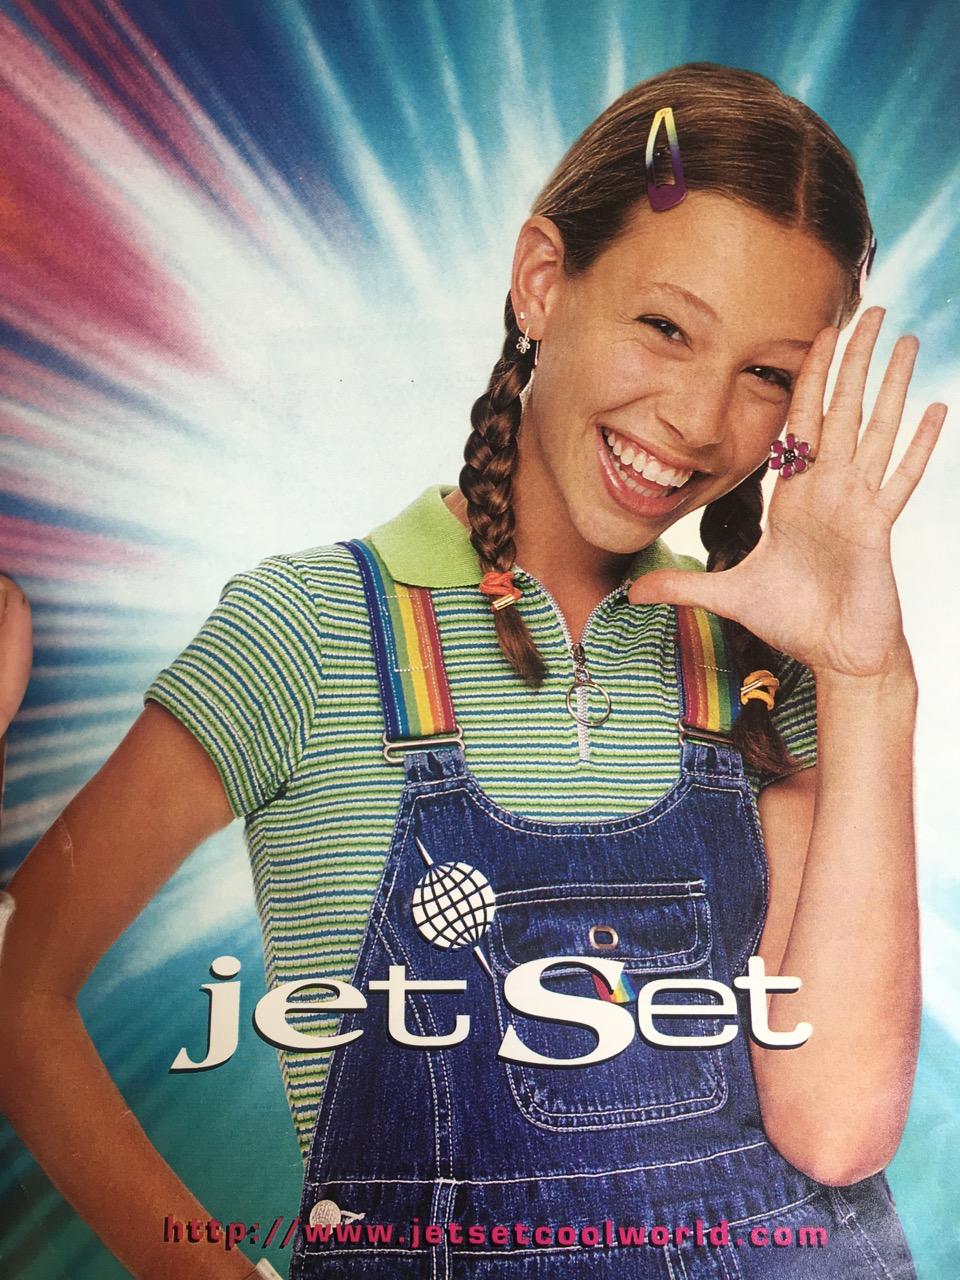 jet set clothing advertisement 1996